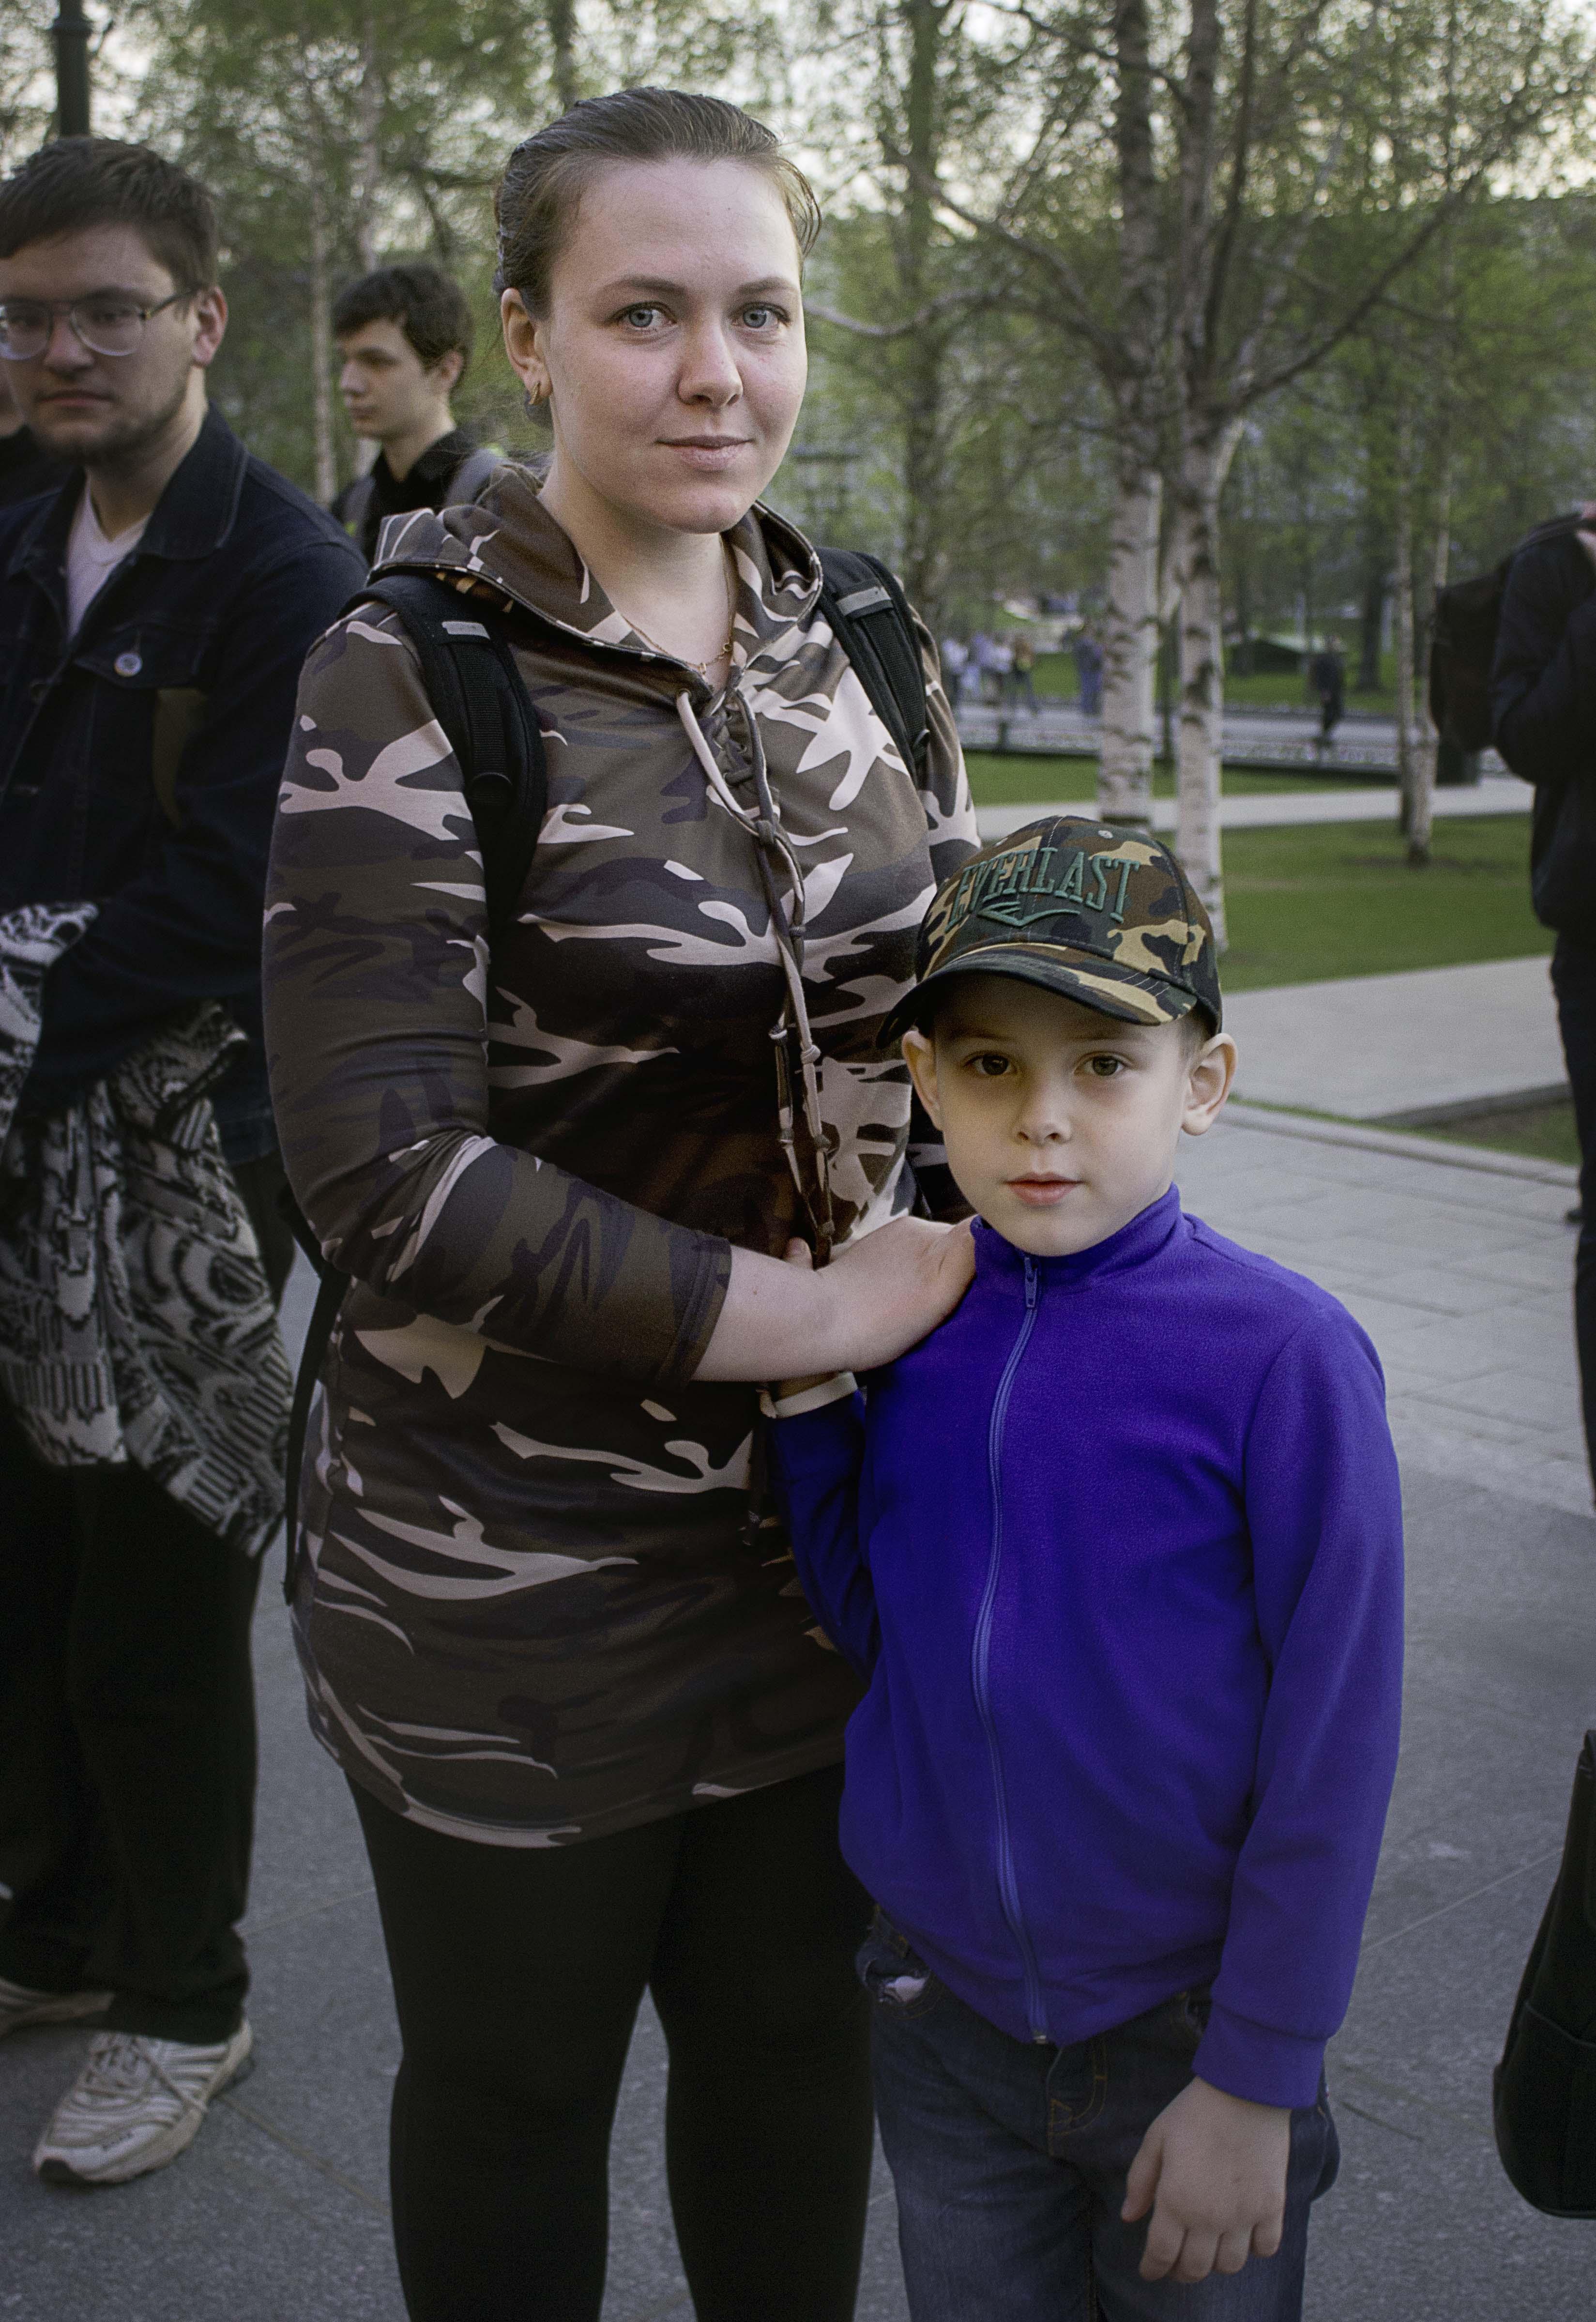 https://img-fotki.yandex.ru/get/194778/36058990.61/0_15fb94_d2e231bf_orig